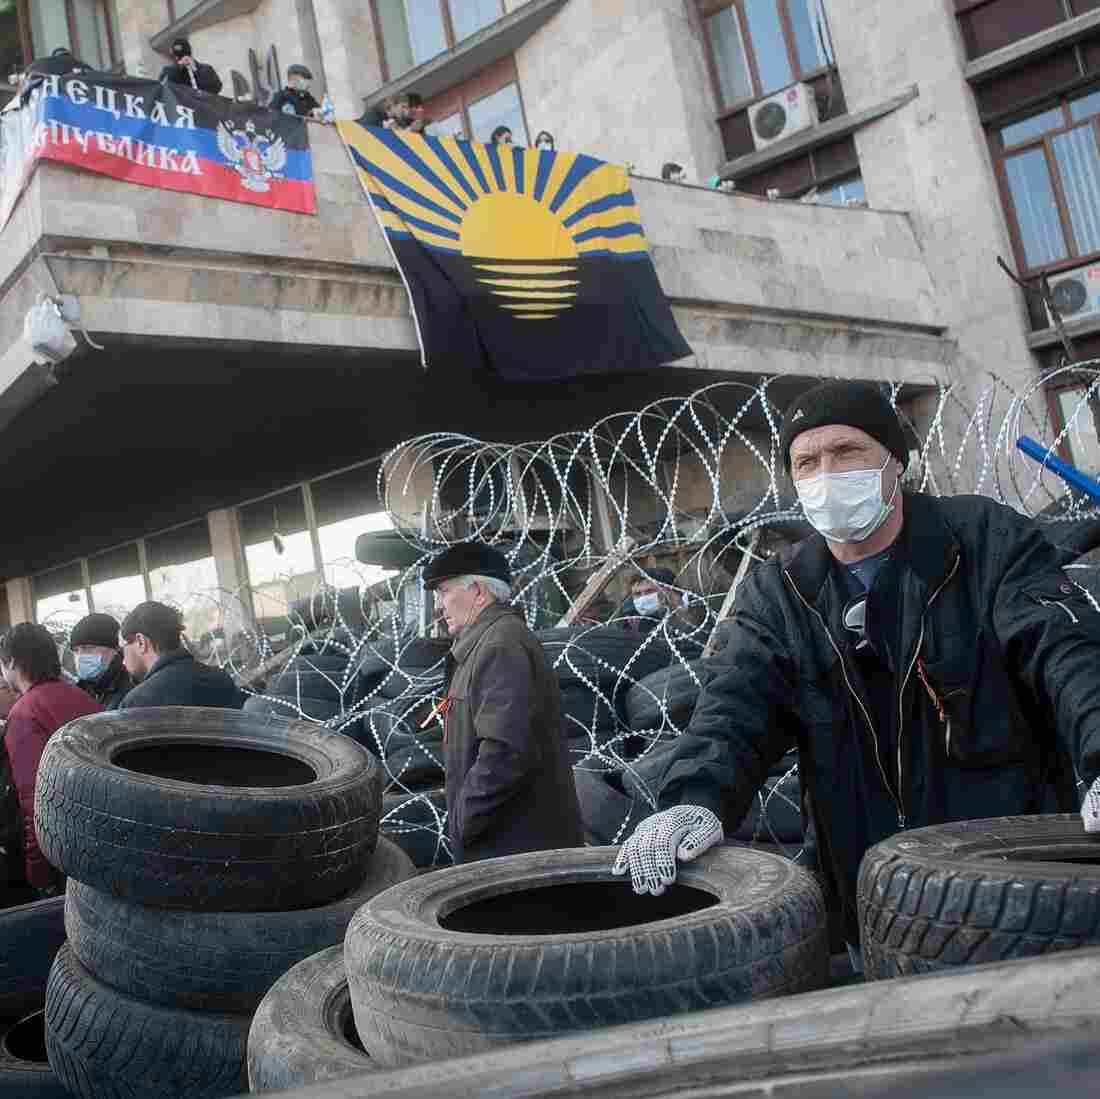 Mob In Ukraine Seizes Provincial Building, Declares Independence